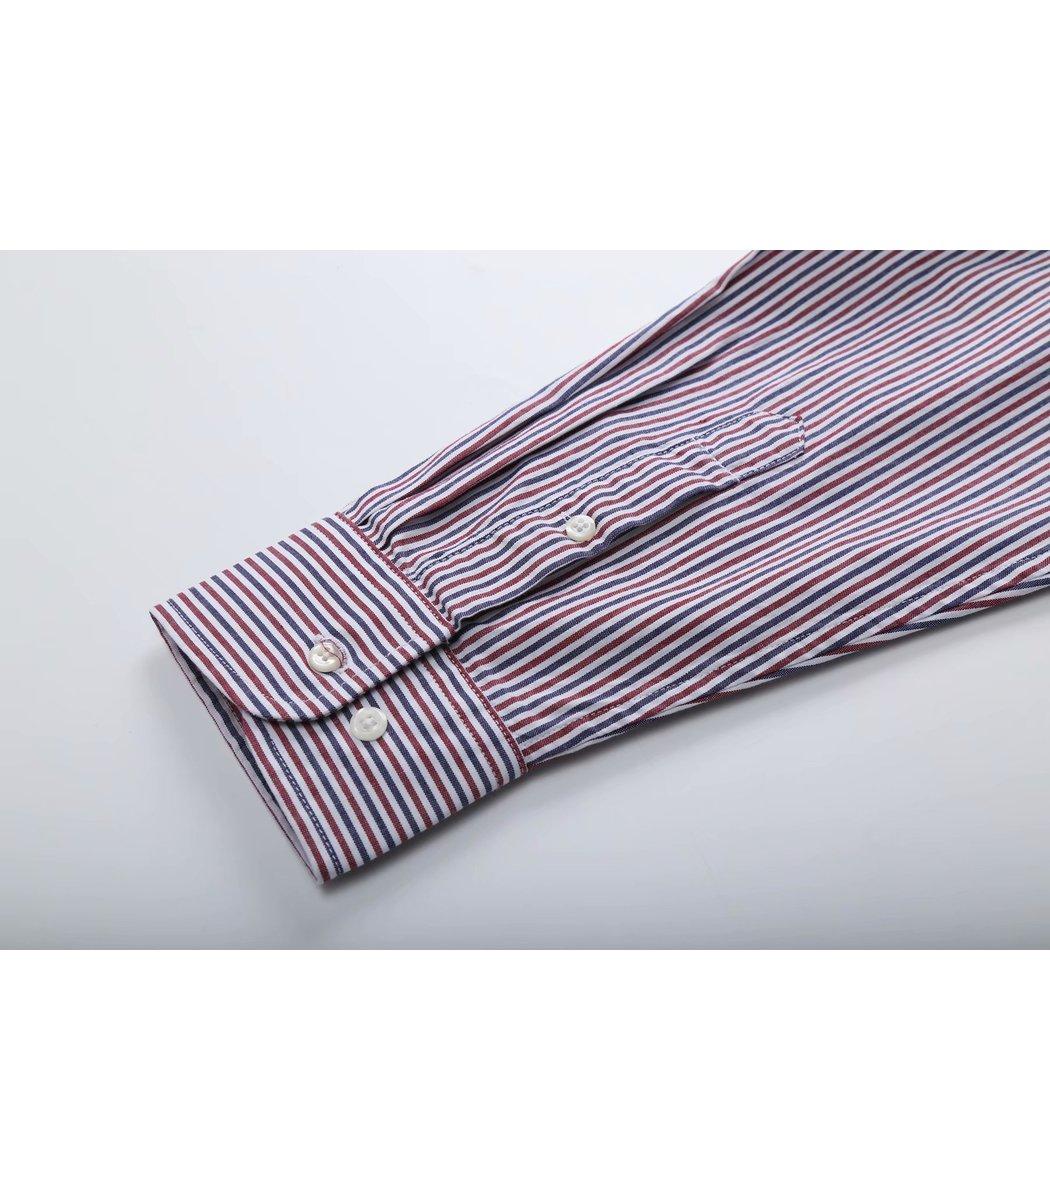 Рубашка POLO Ralph Lauren в полоску мультицвет RR6